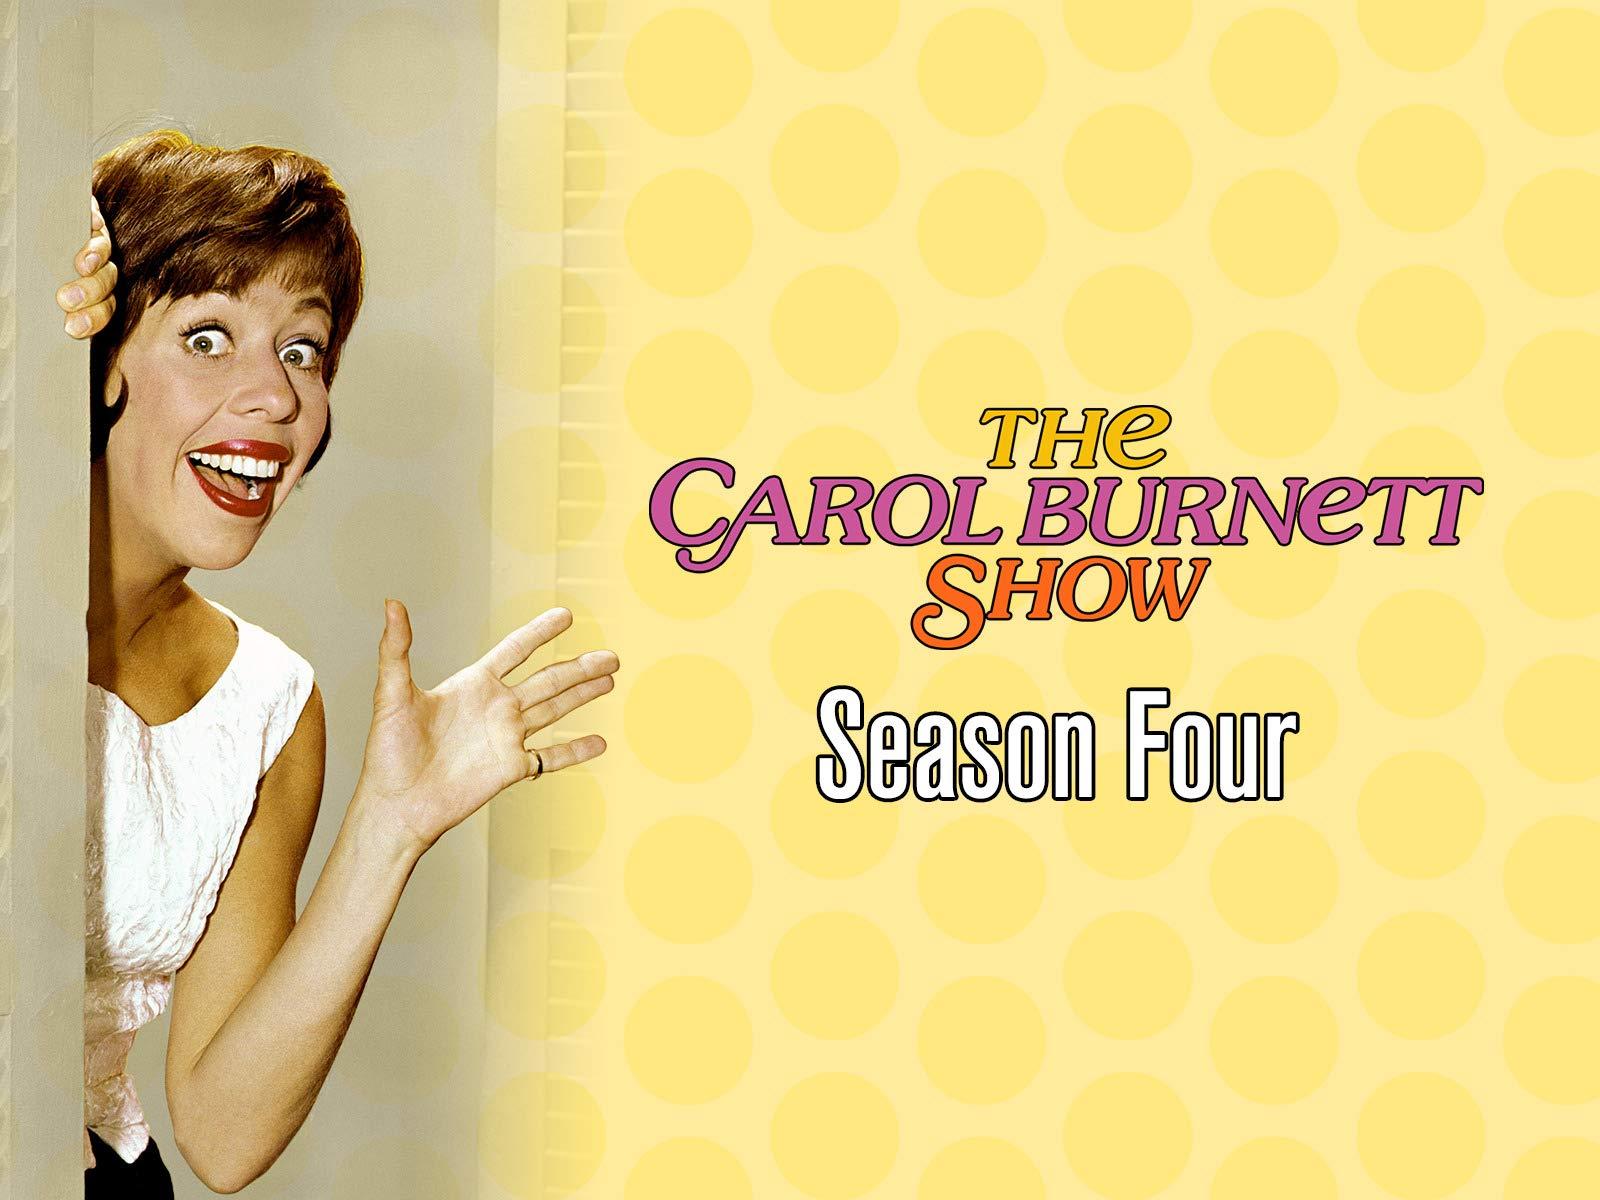 The Carol Burnett Show - Season 4